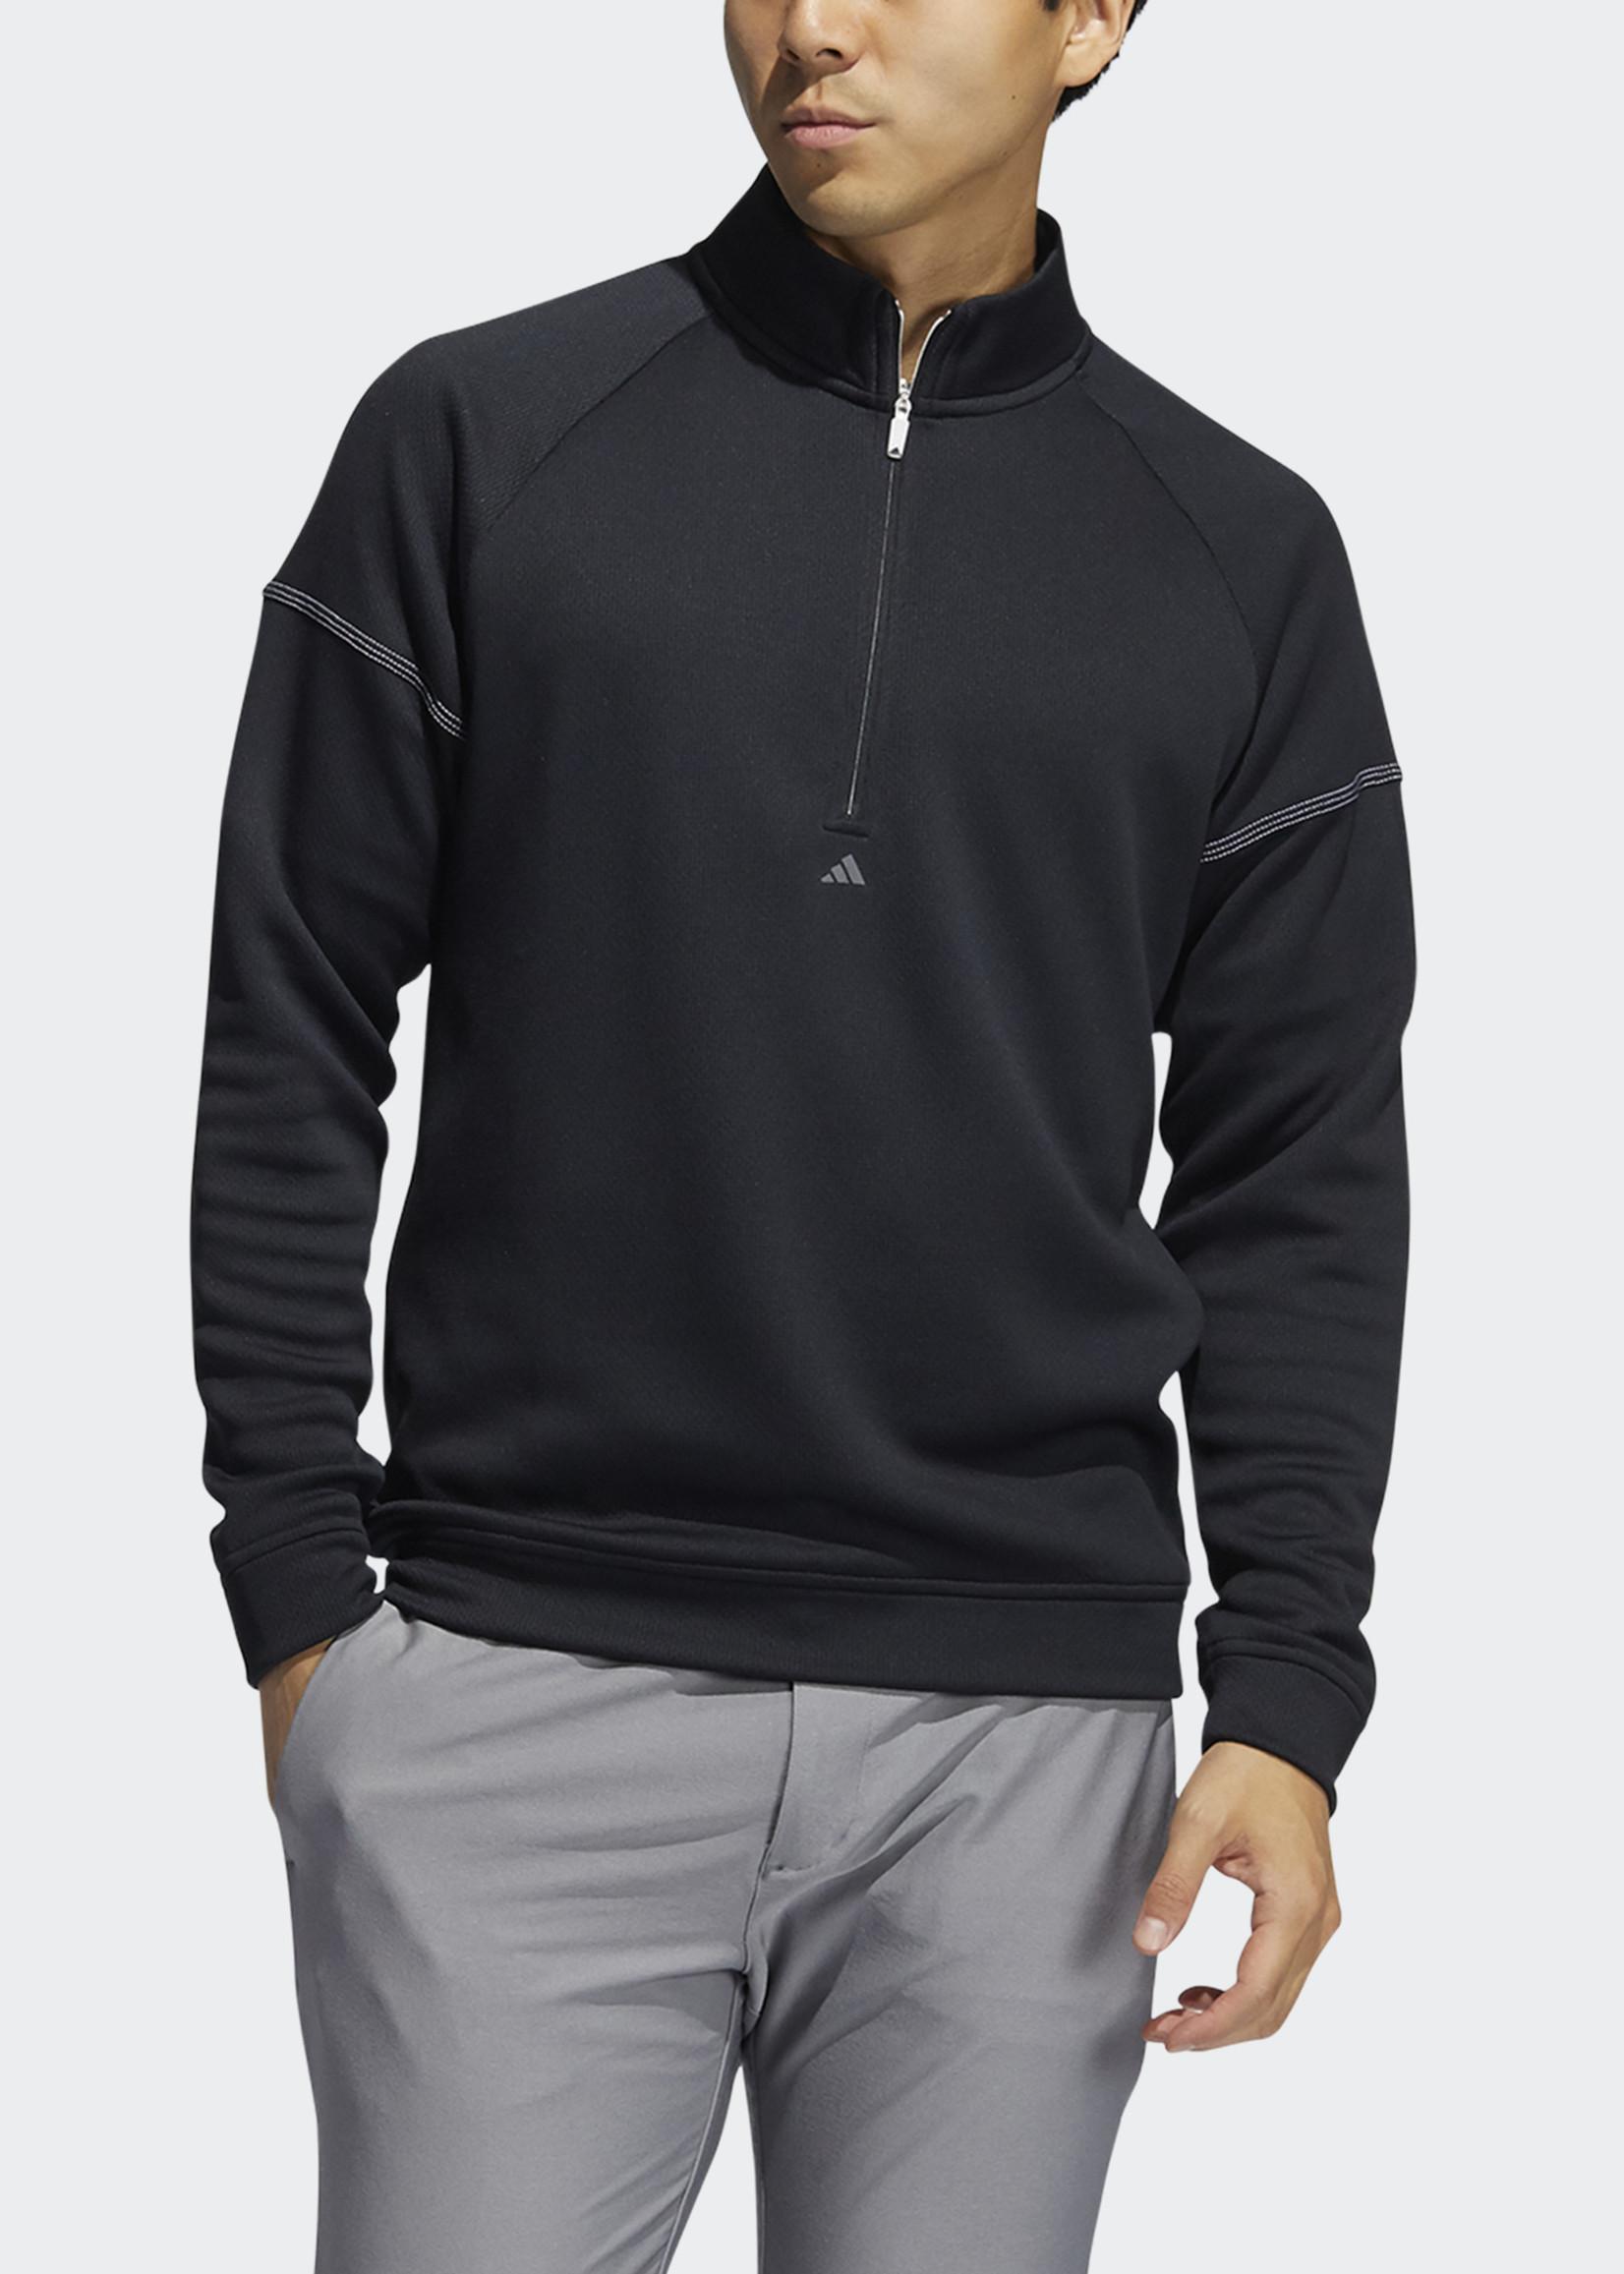 Adidas EQUIPMENT 1/4 ZIP SWEATSHIRT